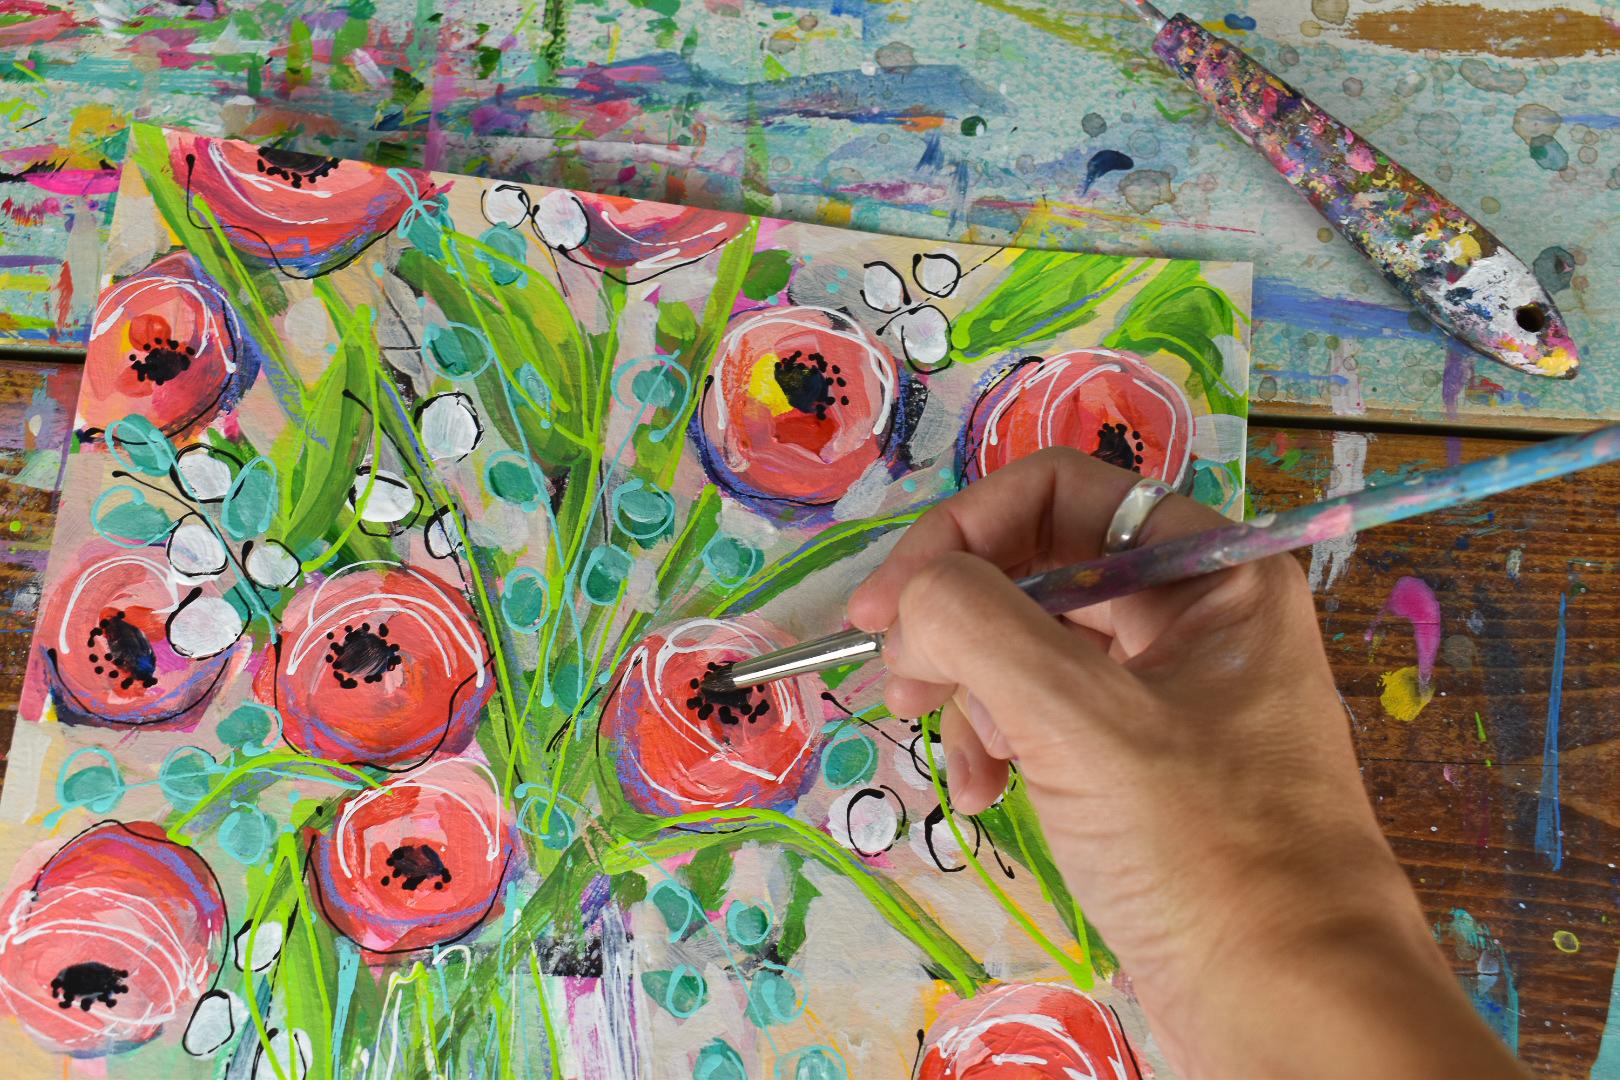 boho_flowers_painting_daisyfaithart_5.jpg